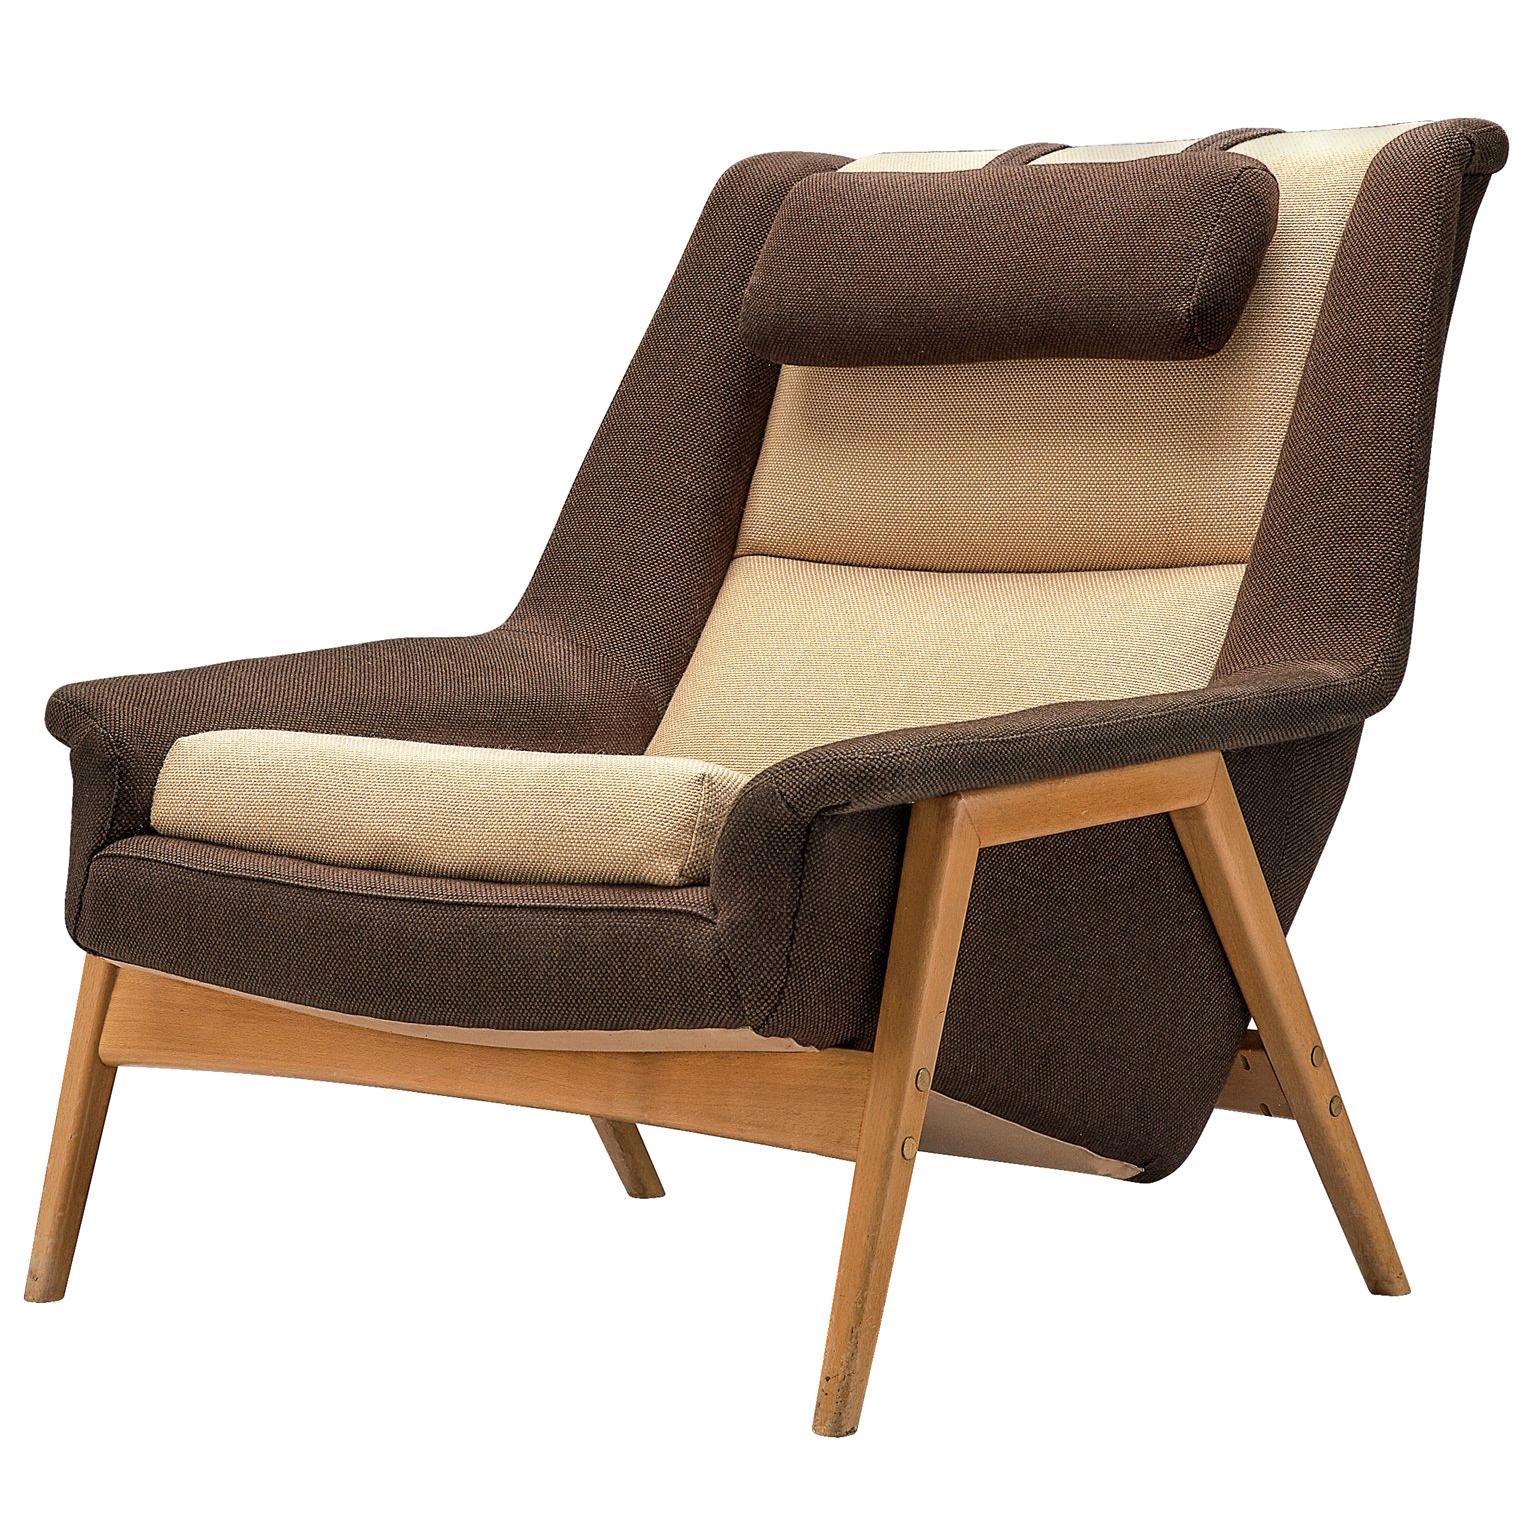 Folke Ohlsson for Fritz Hansen Lounge Chair in Fabric